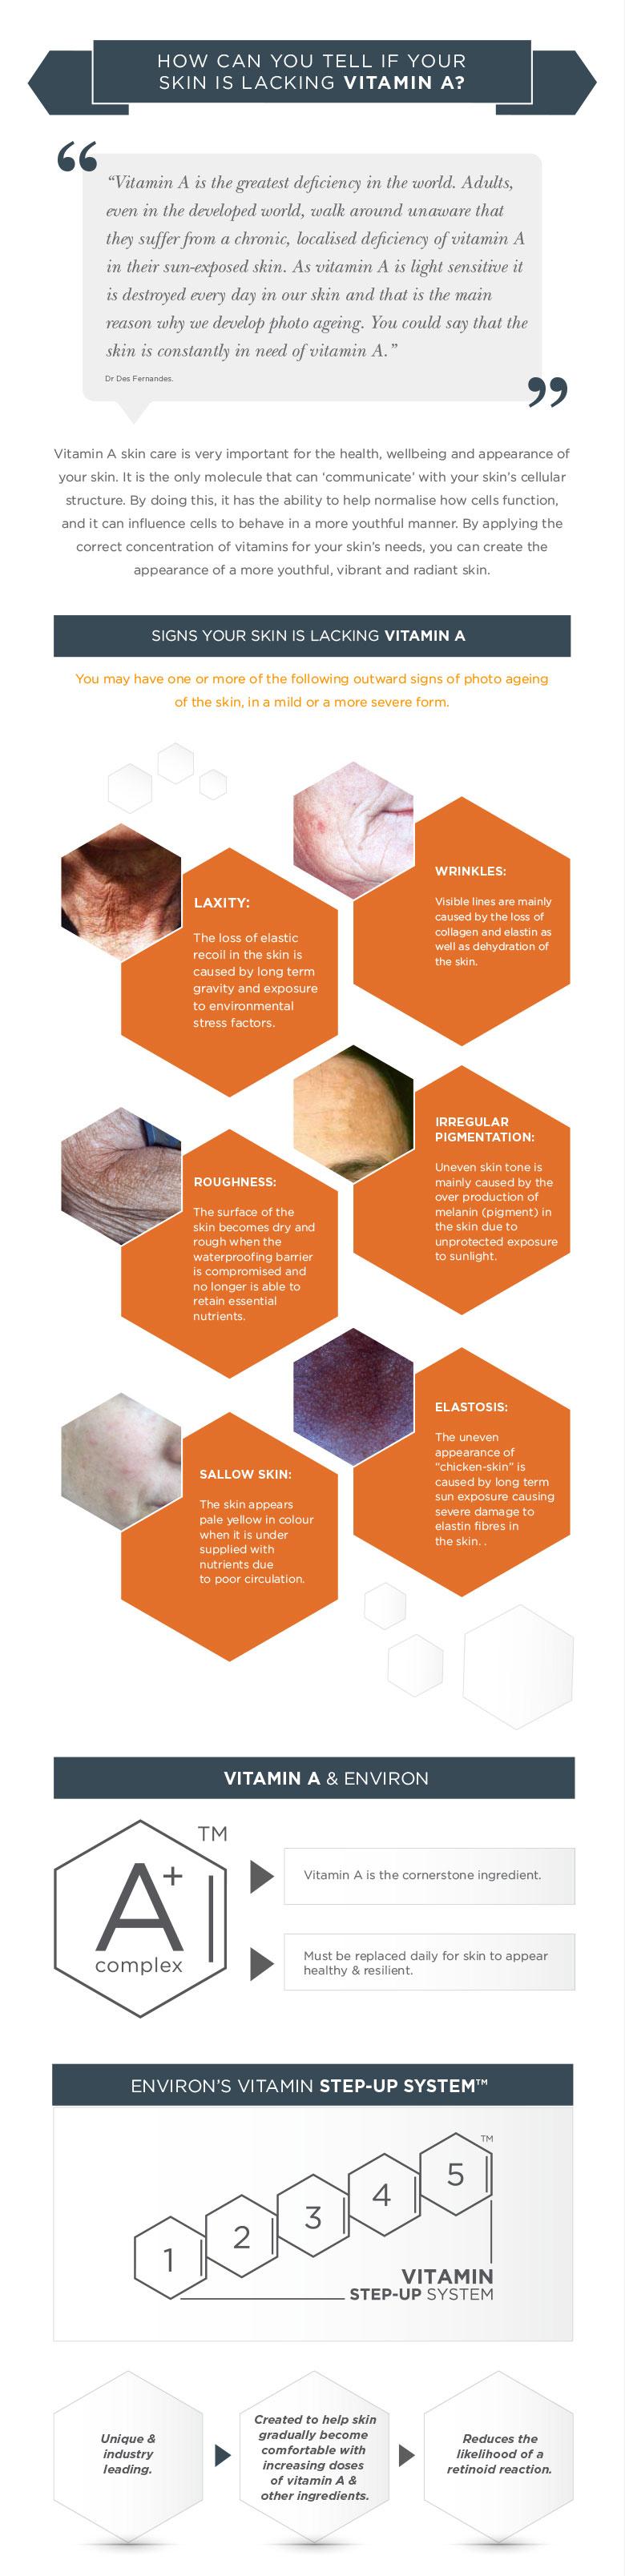 Environ Skin Care - Vitamin A Skin Care Infographic